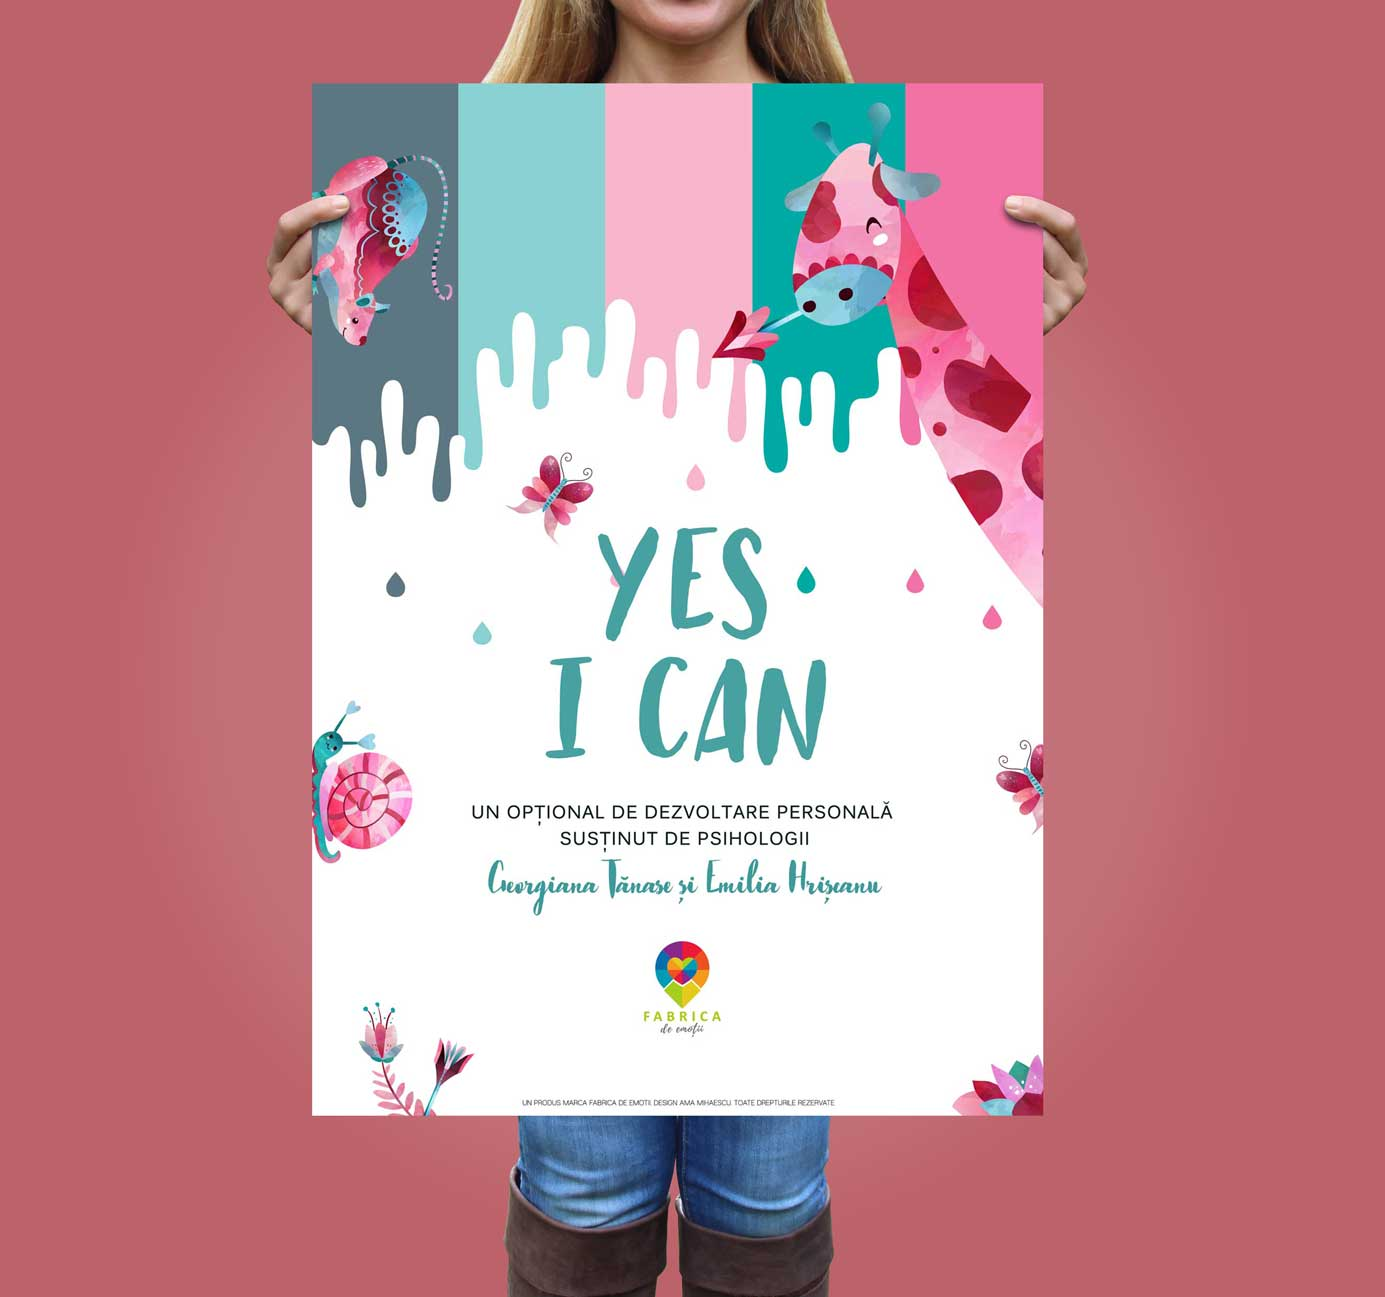 Mockup-Poster-Yes-I-can Fabrica de Emotii Ama Mihaescu Creative Studio